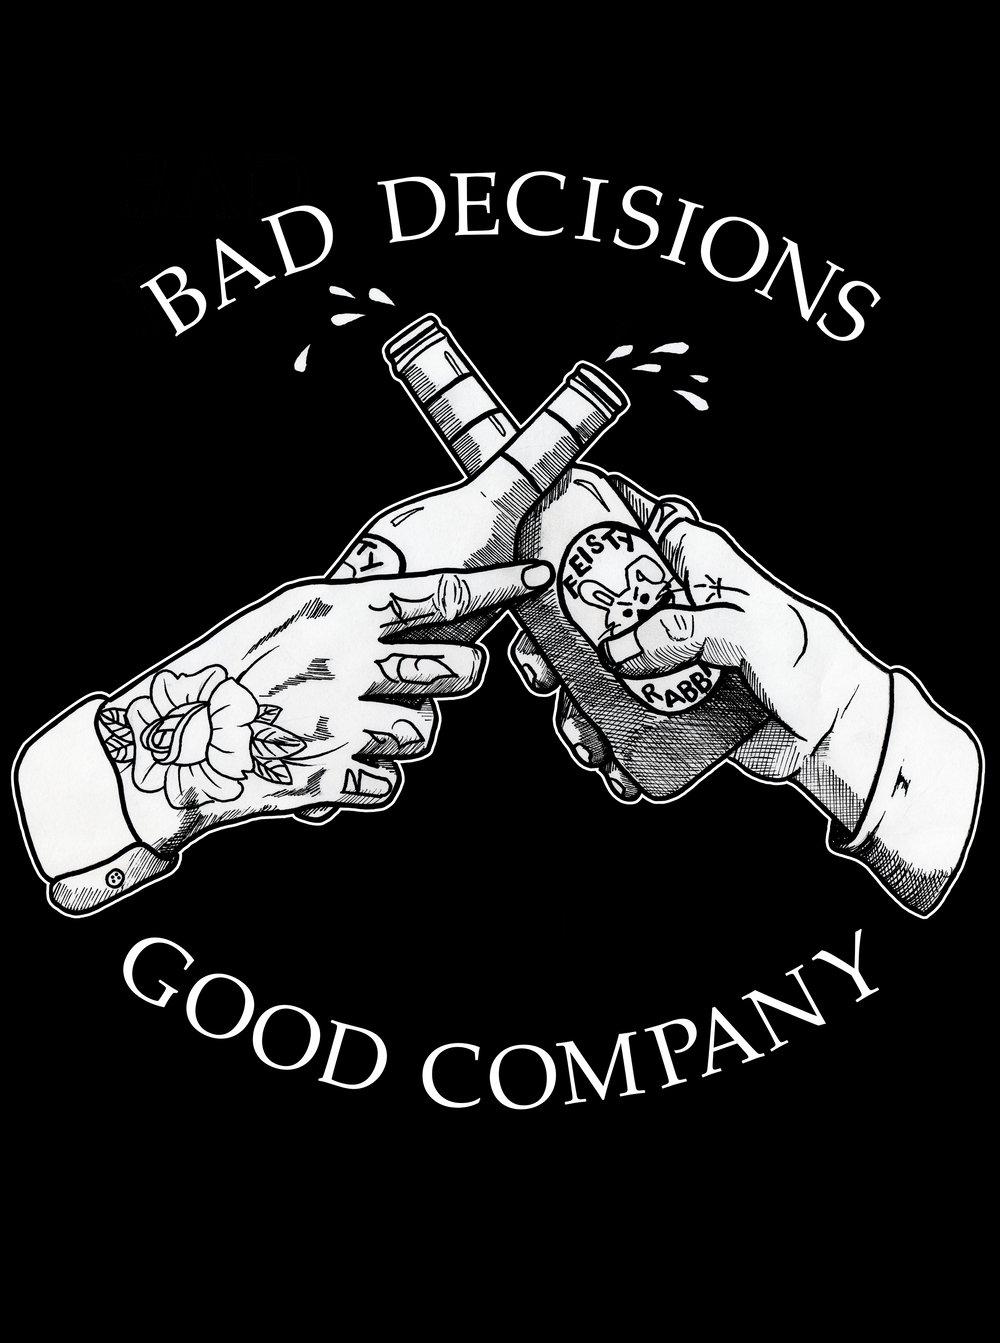 Bad Decisions Good Company